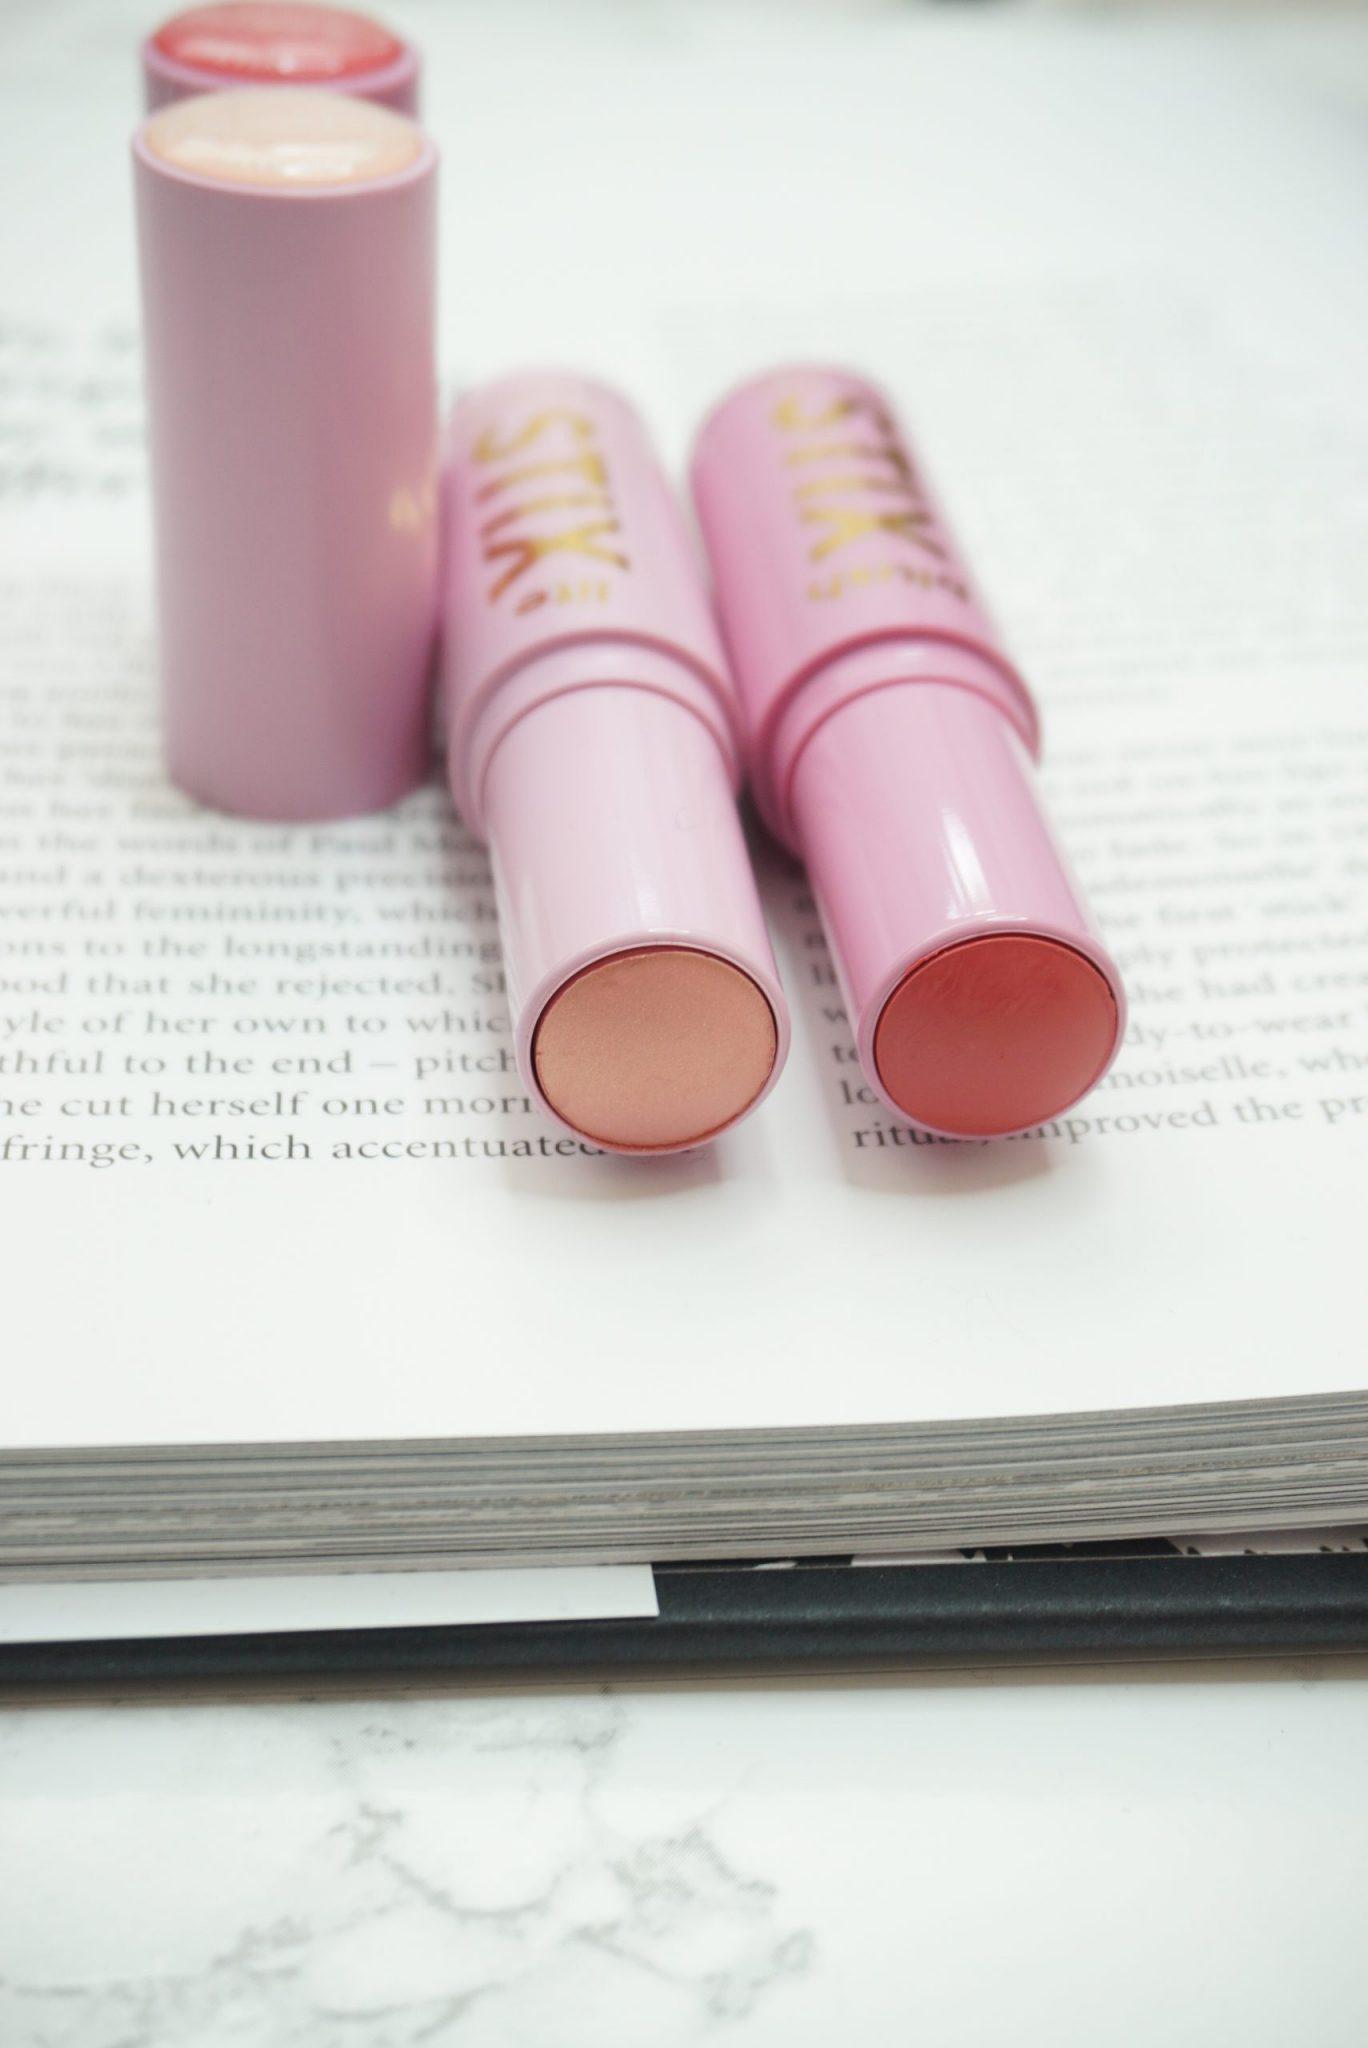 Affordable Colourpop Blush Stix & Highlighter Stix Review ⋆ Beautymone